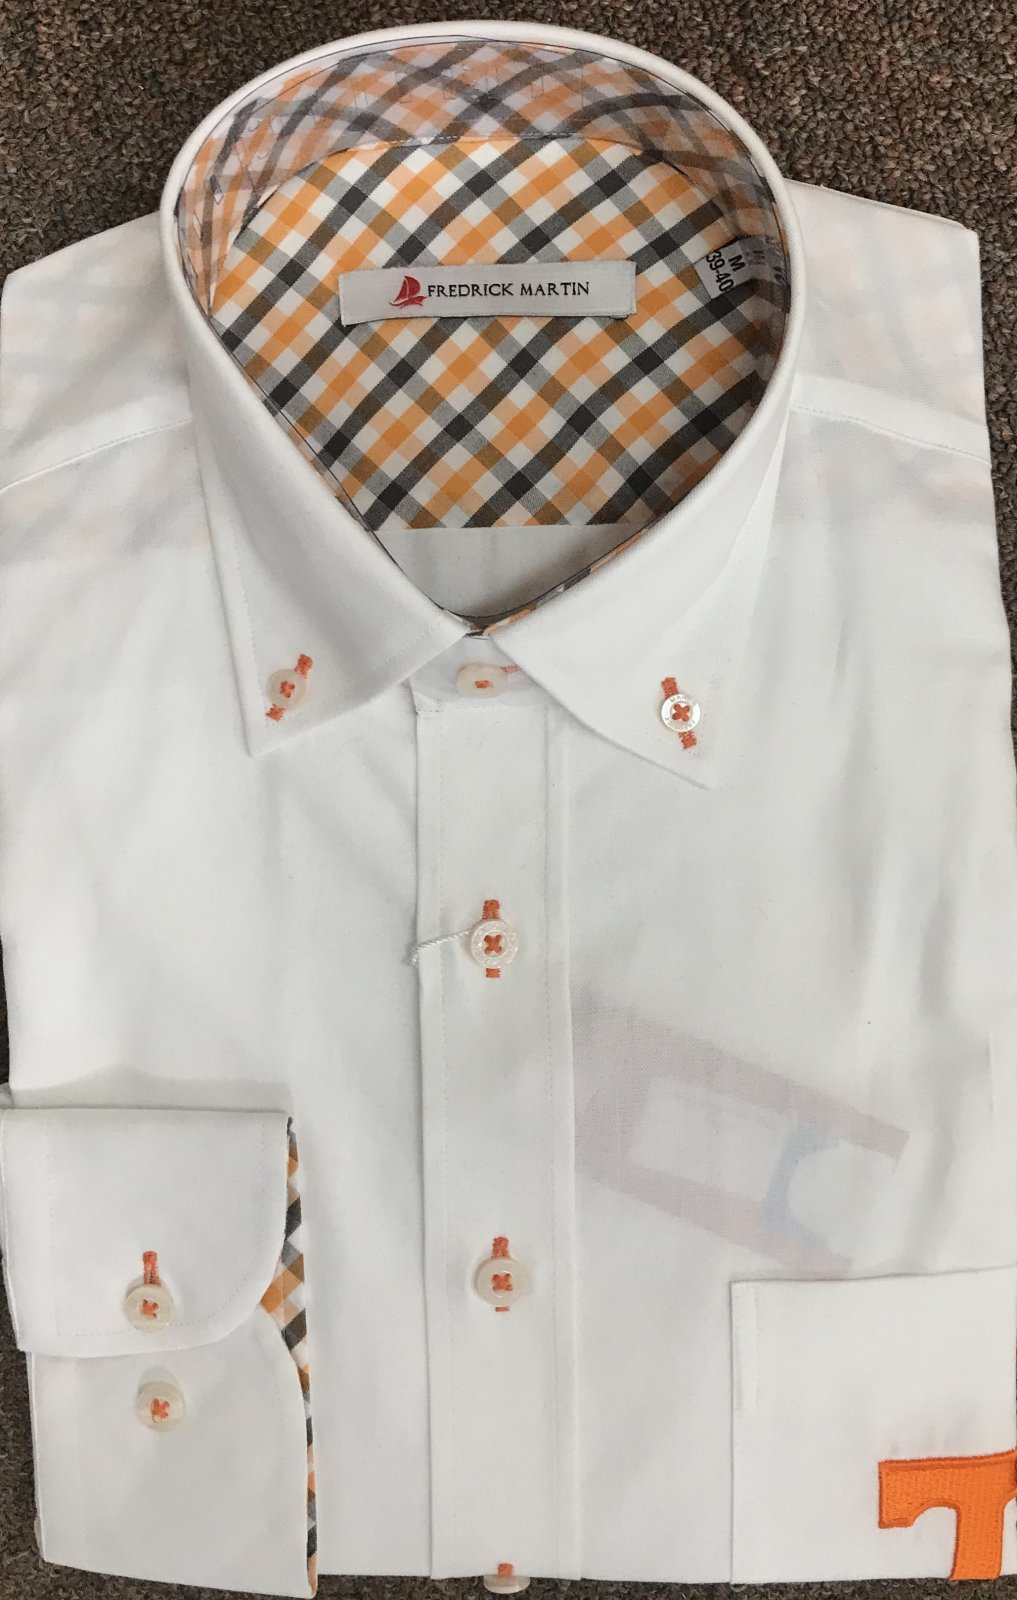 Frederick Martin LS Collegiate Shirt